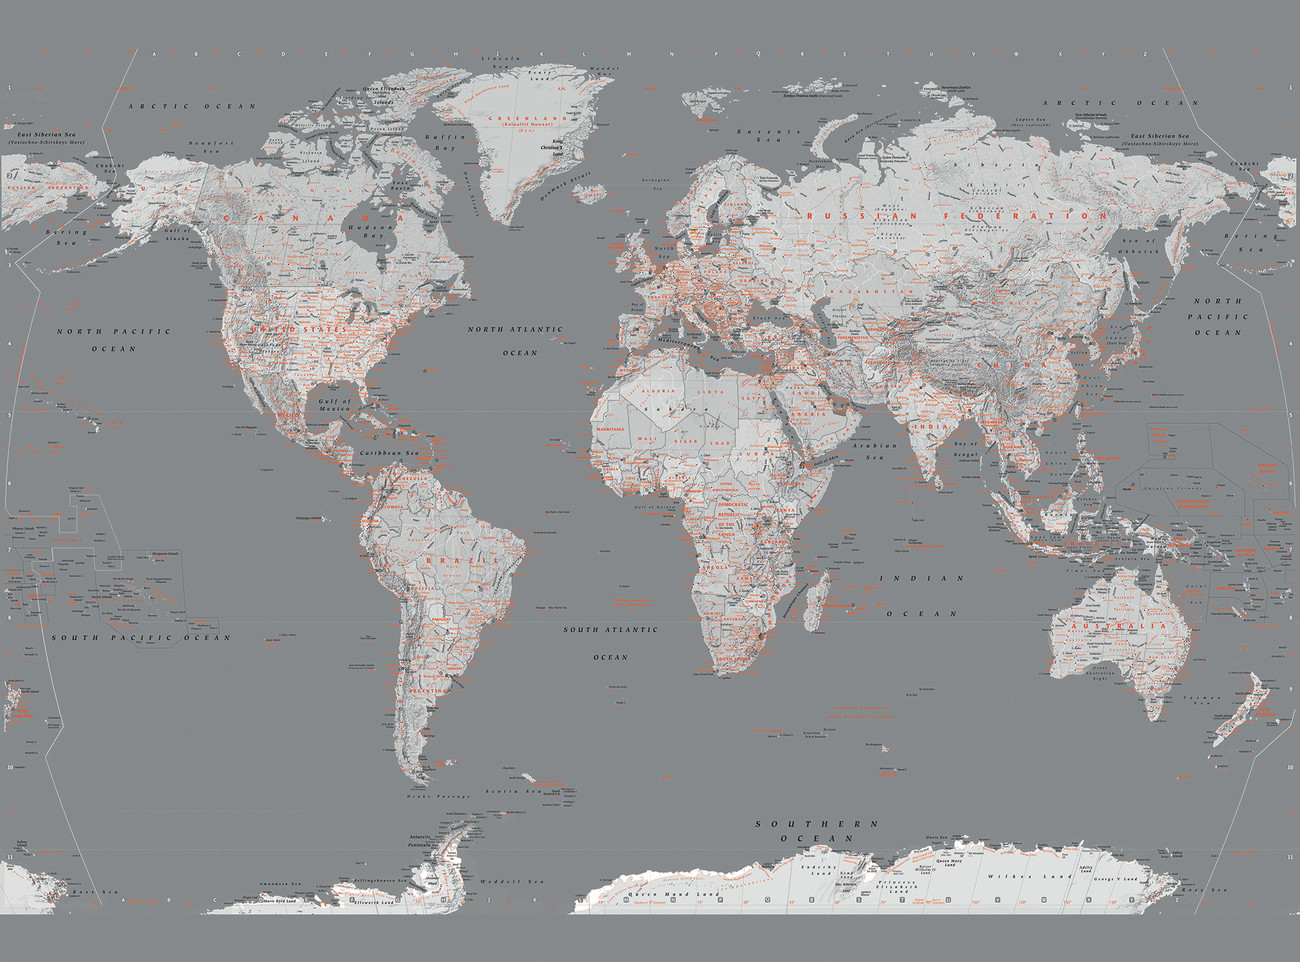 Fotomurale mapa del mundo plata y naranja papel pintado - Papel pintado mapa del mundo ...